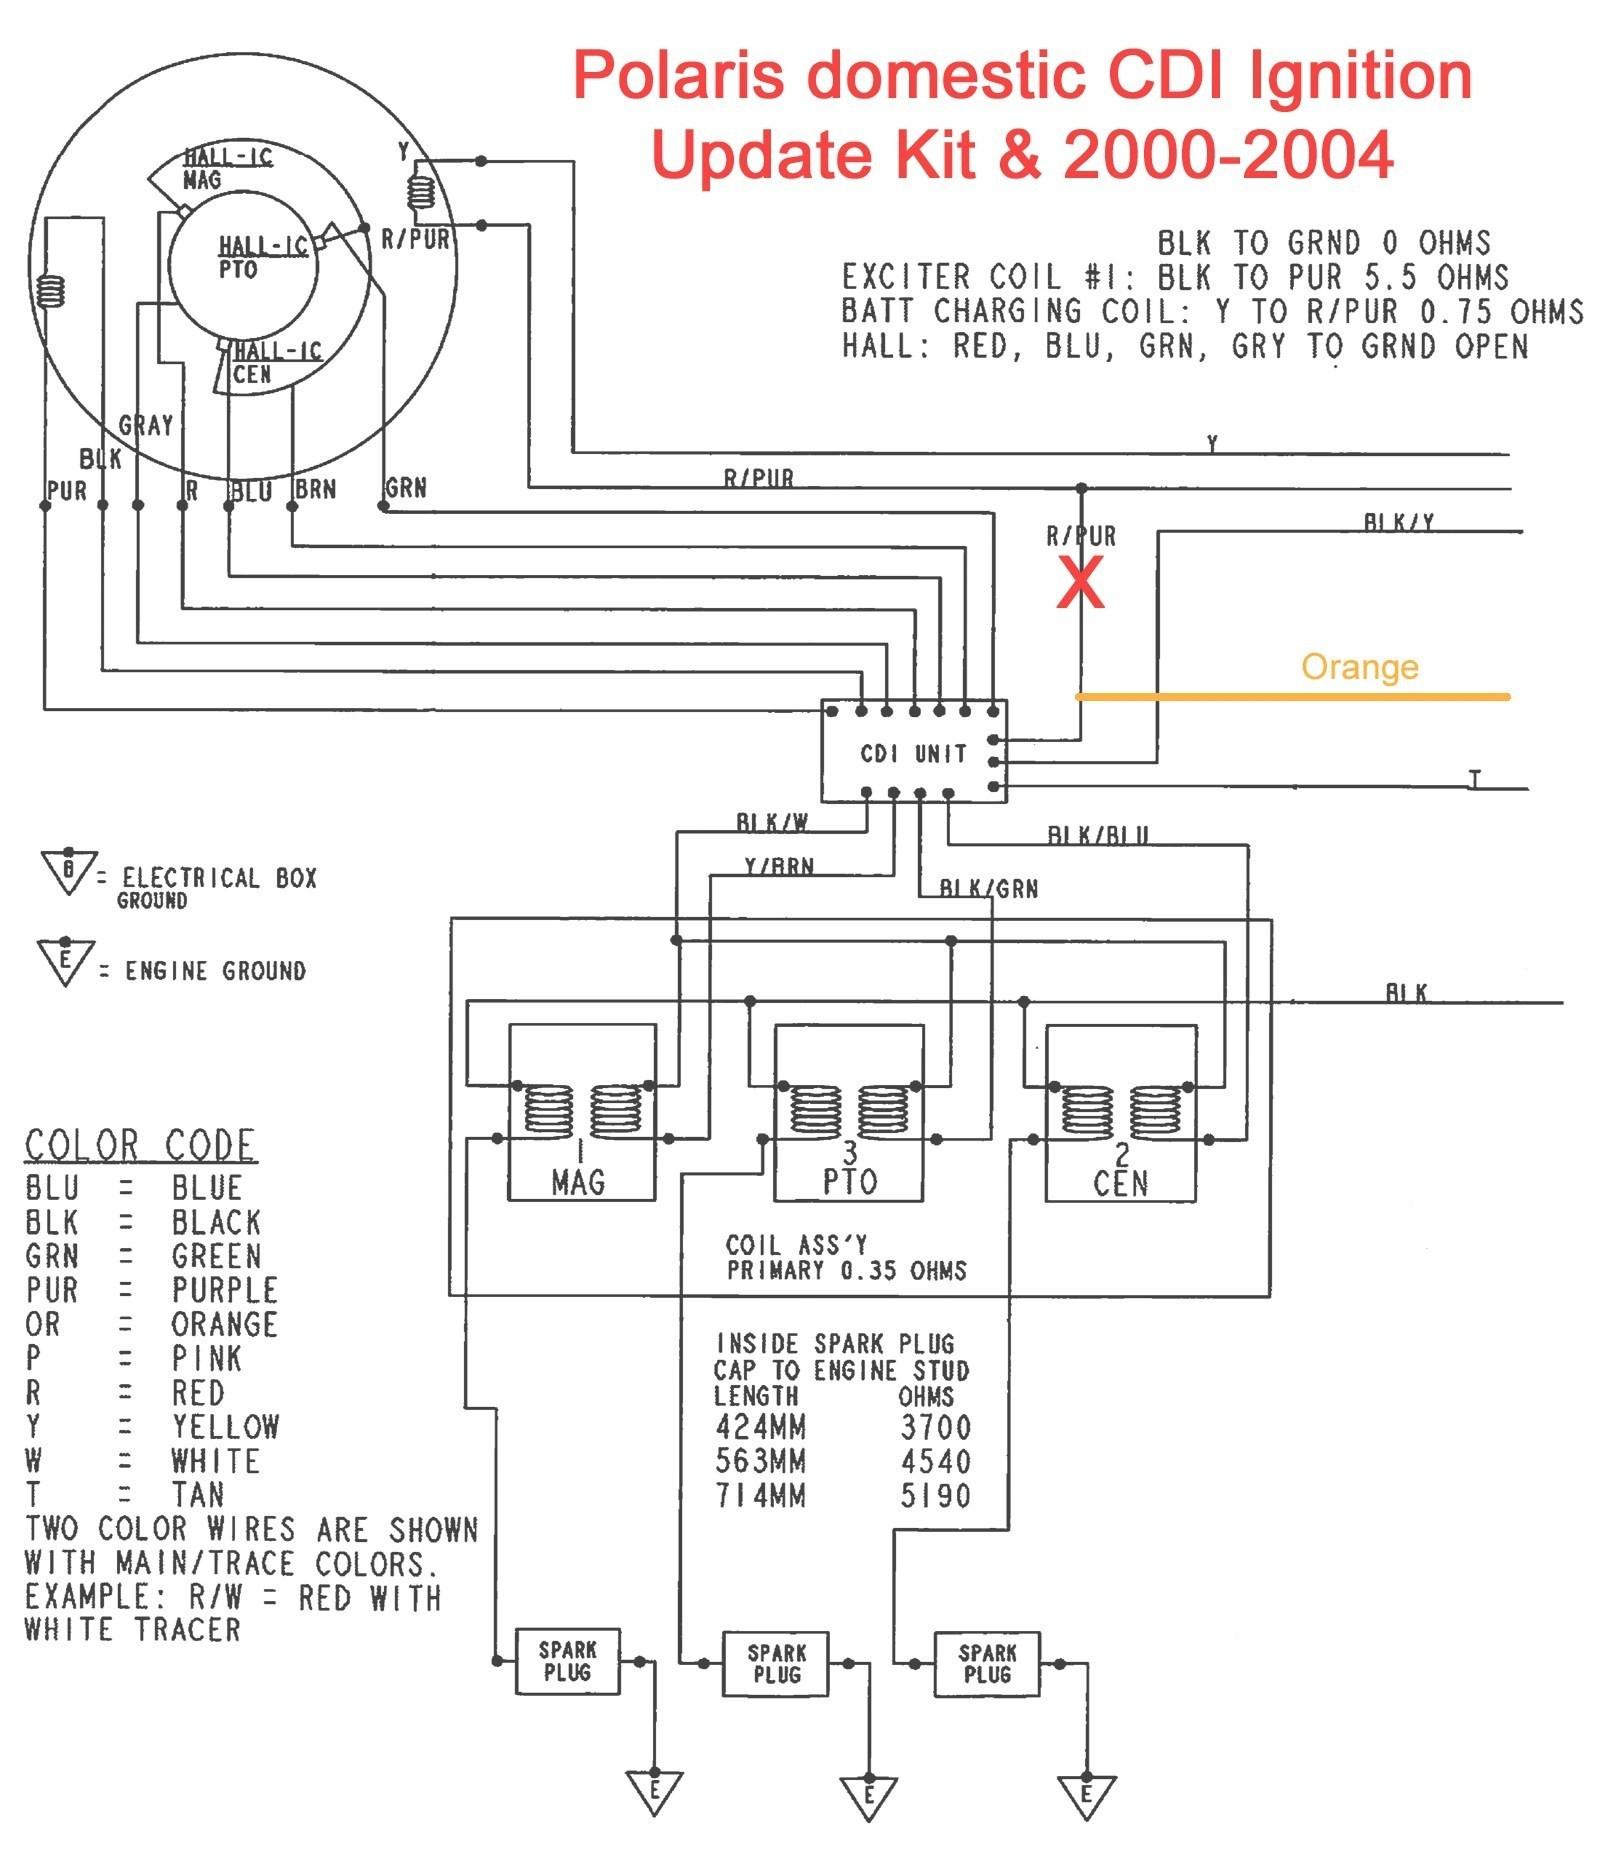 polaris xplorer 400 wiring diagram free picture 2006 polaris sportsman 90 wiring diagram wiring diagrams dat  2006 polaris sportsman 90 wiring